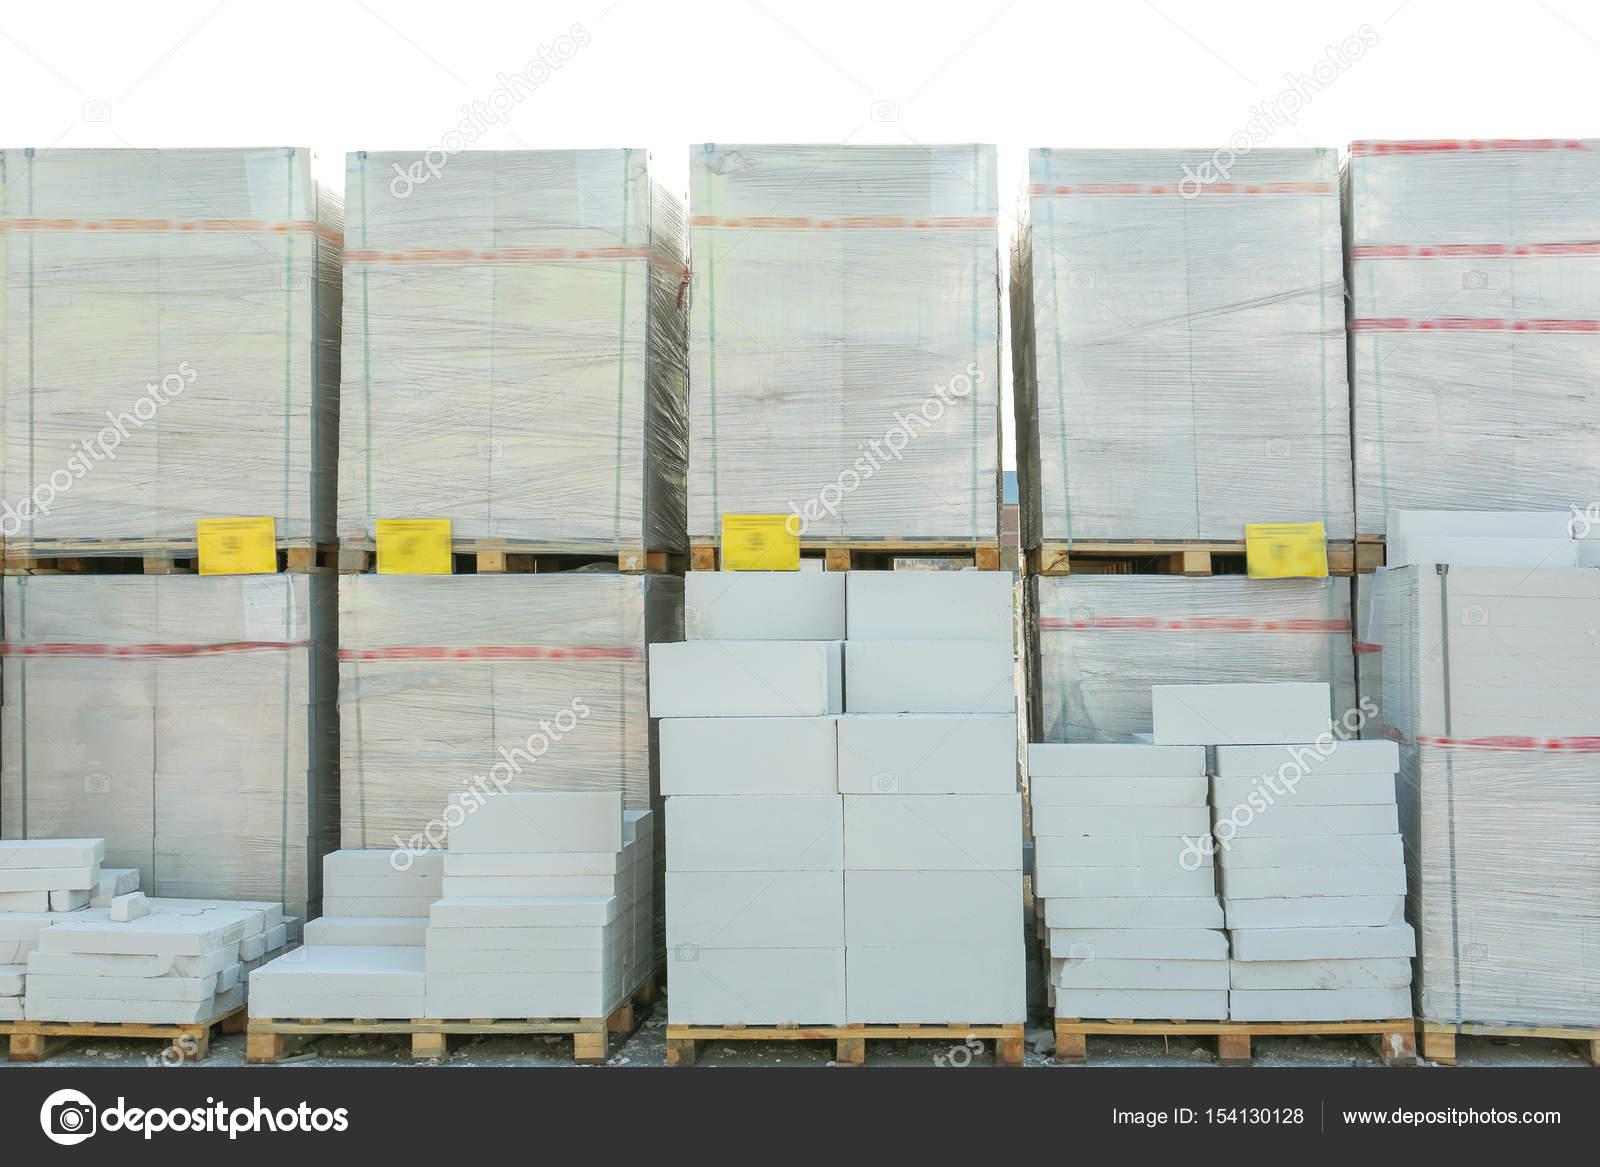 727edc0b9e5b Εμπορευμάτων για χονδρική πώληση σε εξωτερικούς χώρους — Εικόνα από ...